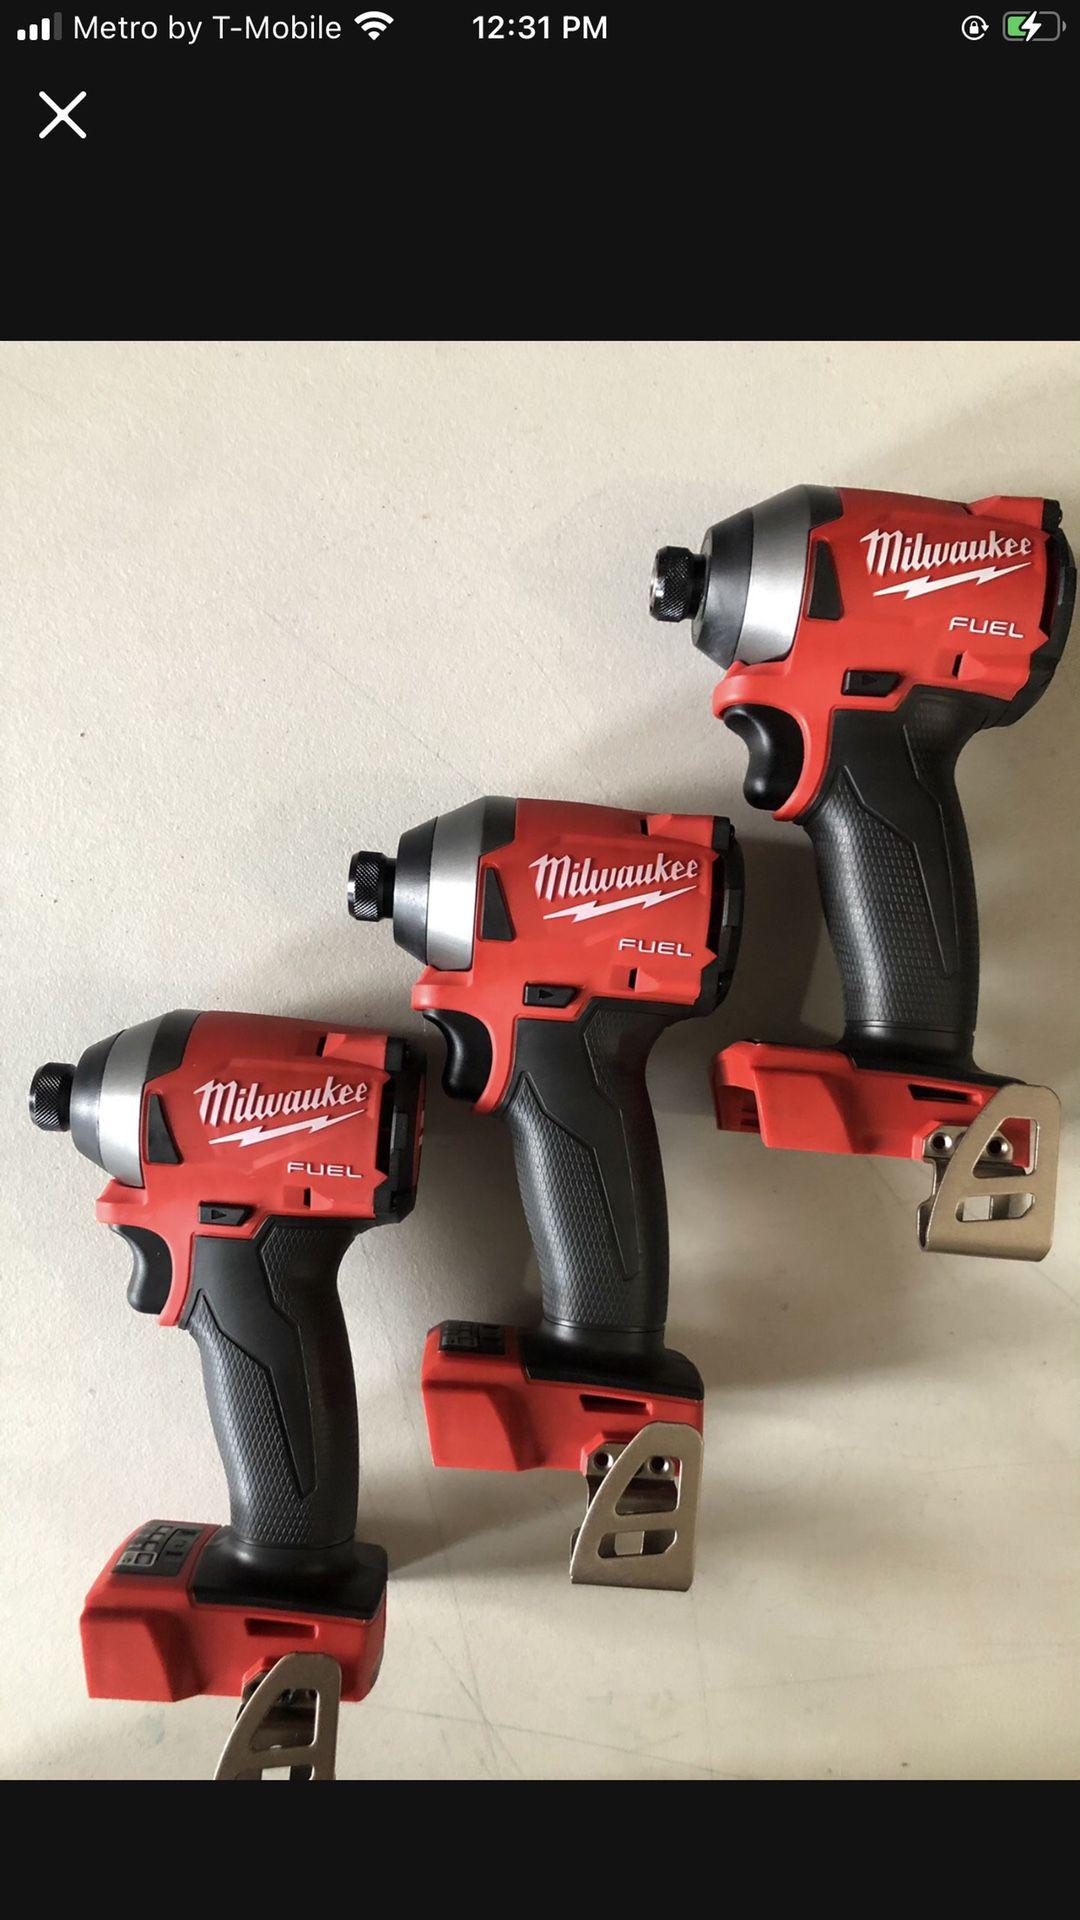 Milwaukee New Impact M18fuel -3 Speeds $99 Each